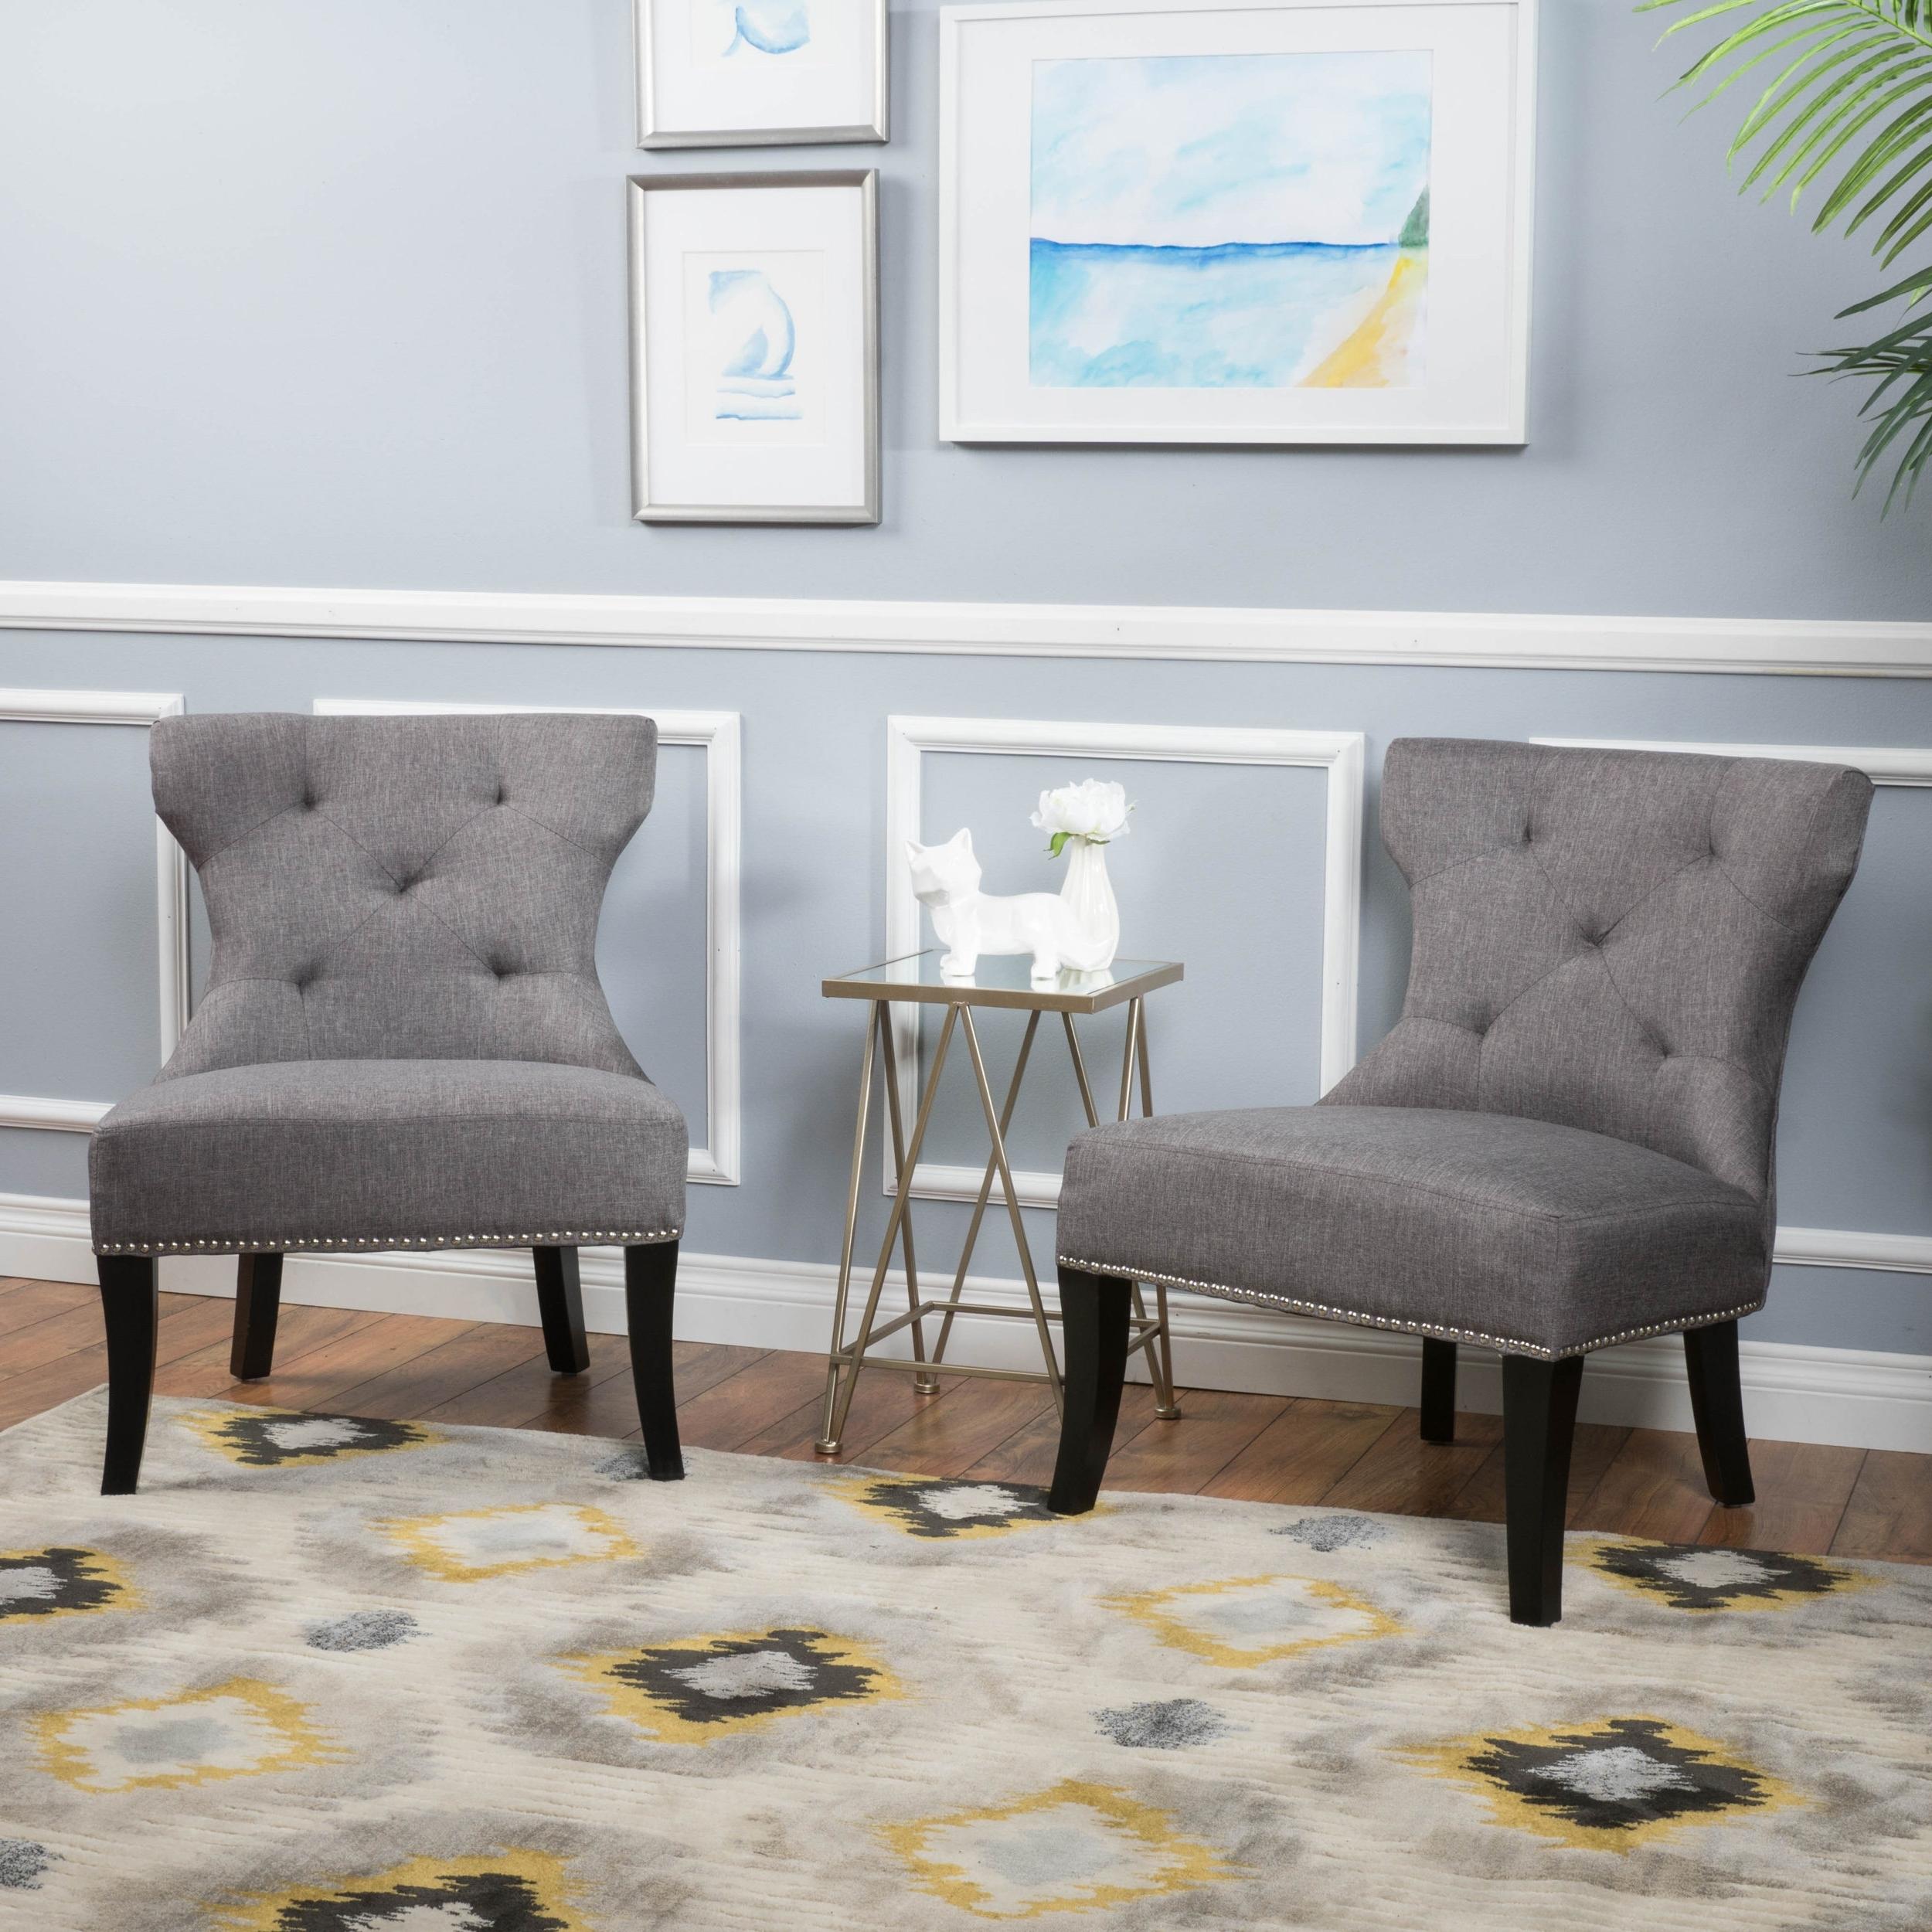 Latest Moraga Barrel Coffee Tables Throughout Mercer41 Moraga Slipper Chair & Reviews (View 8 of 20)